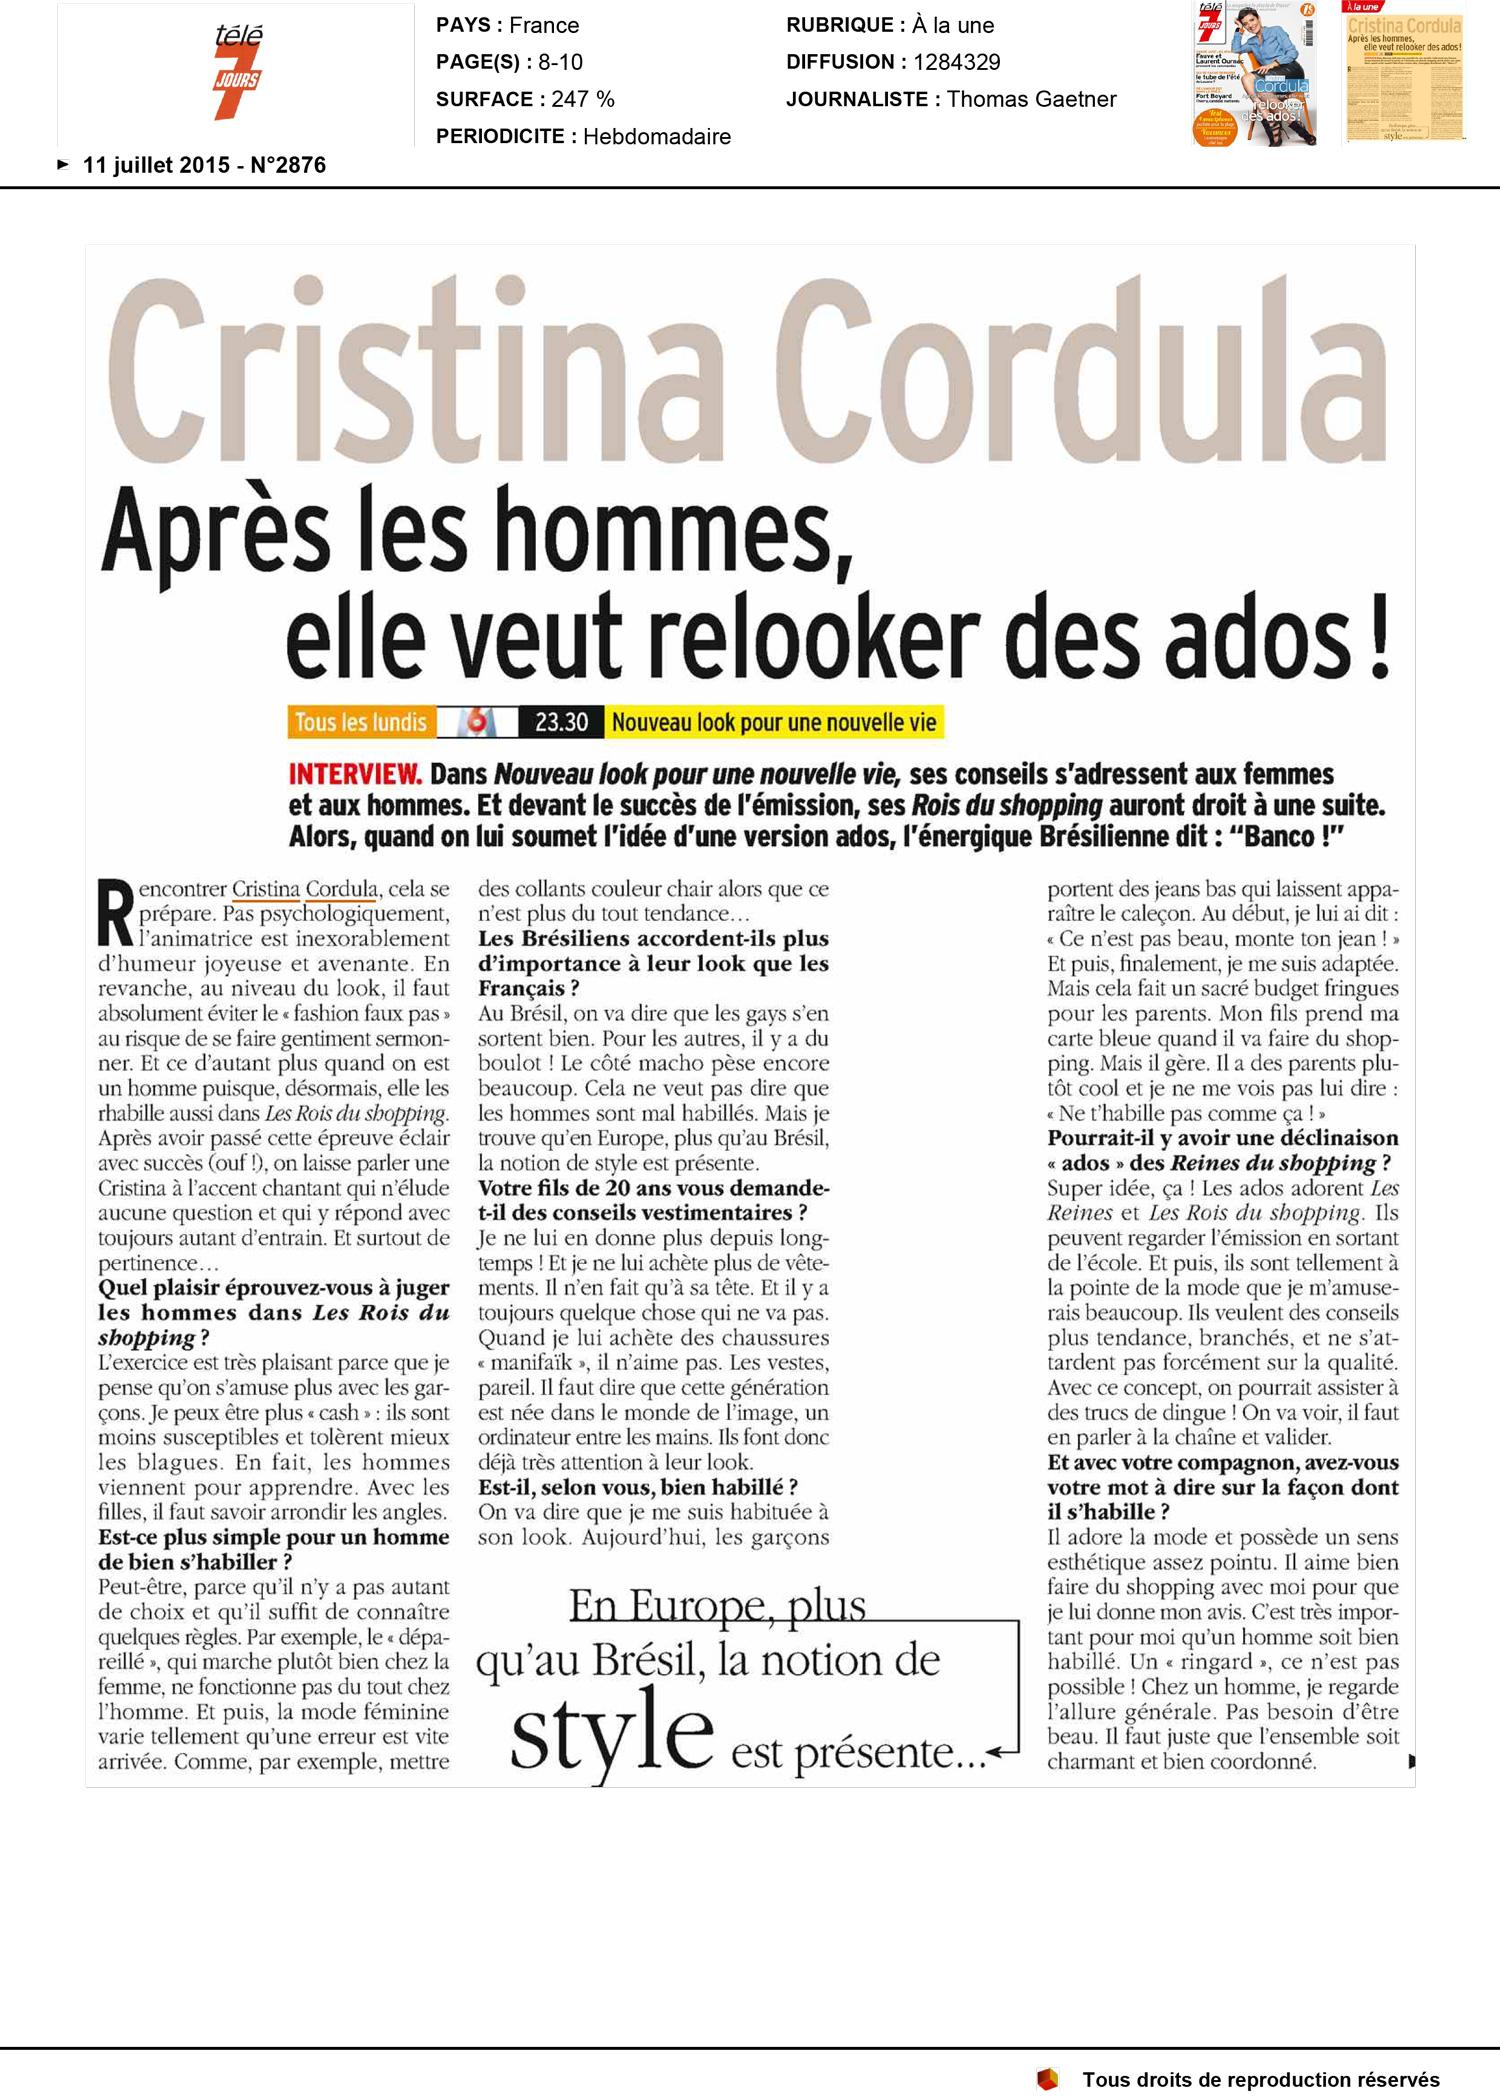 01.Cristina-Cordula-11-07-15-Tele-7-Jours-1